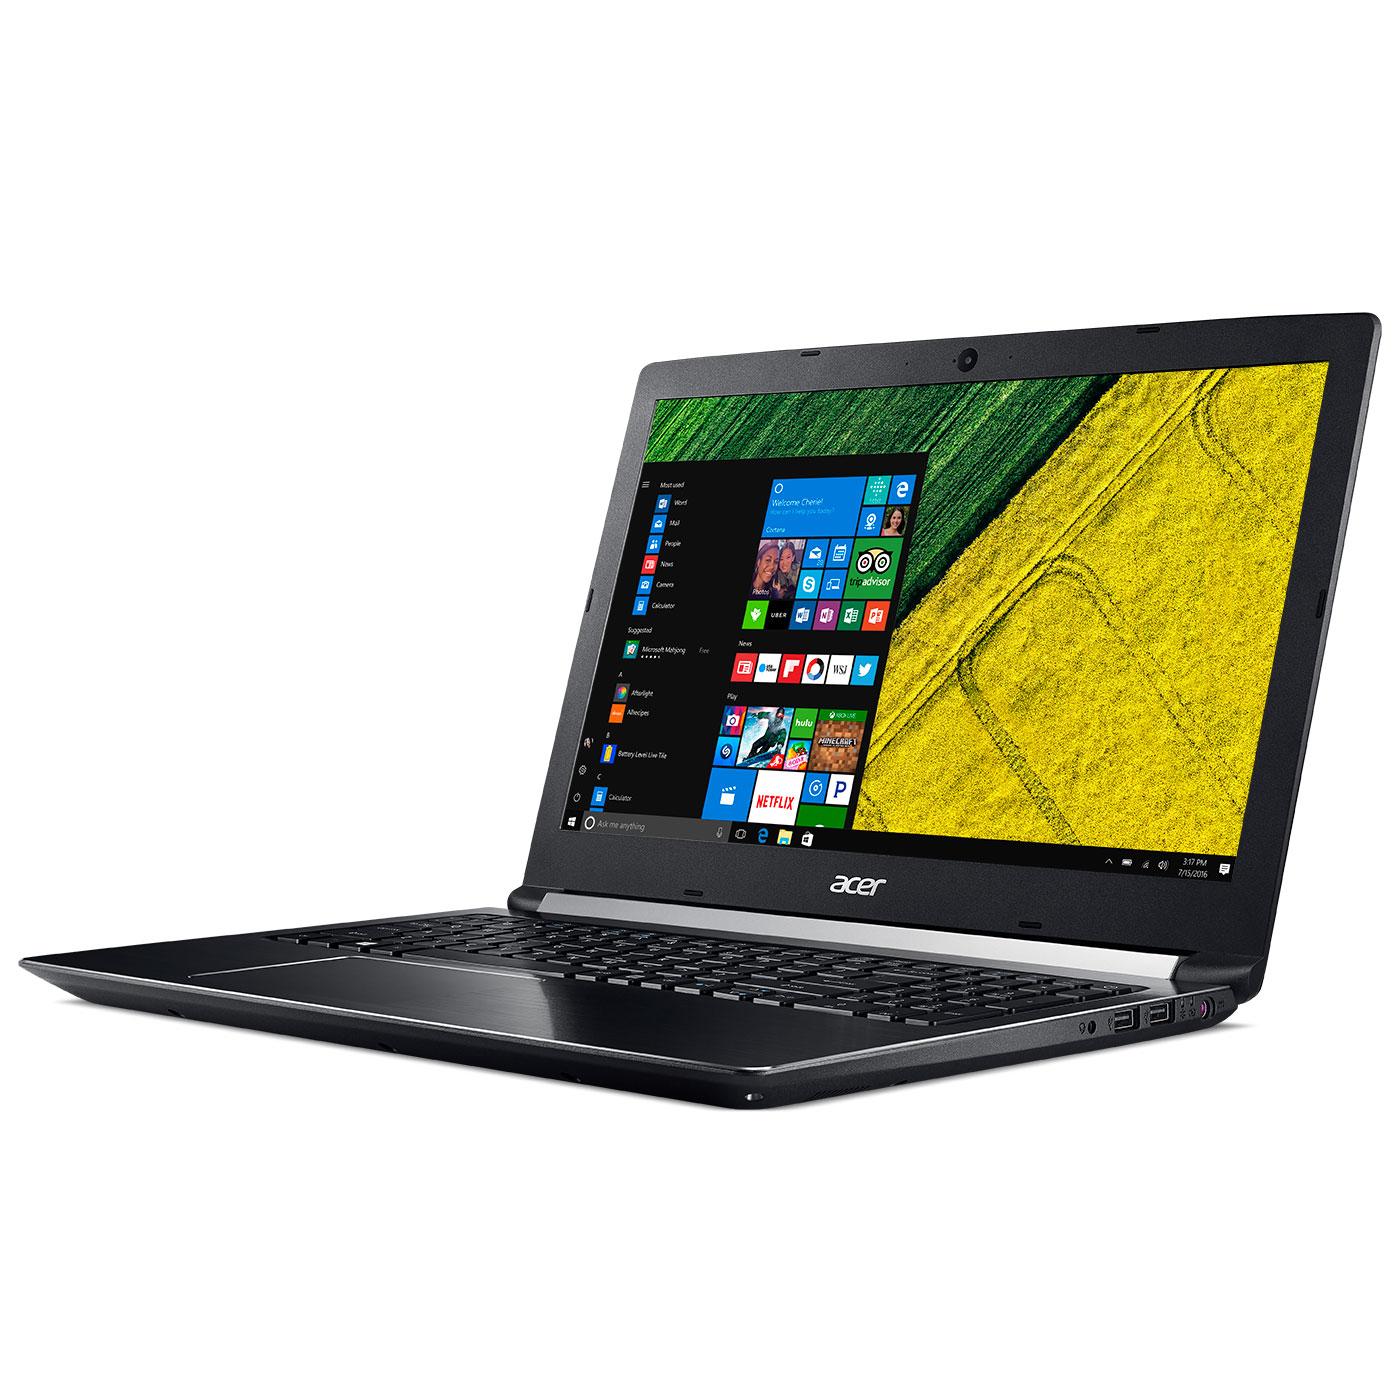 Acer NX.GP8EF.003 - PC portable Acer - Cybertek.fr - 4